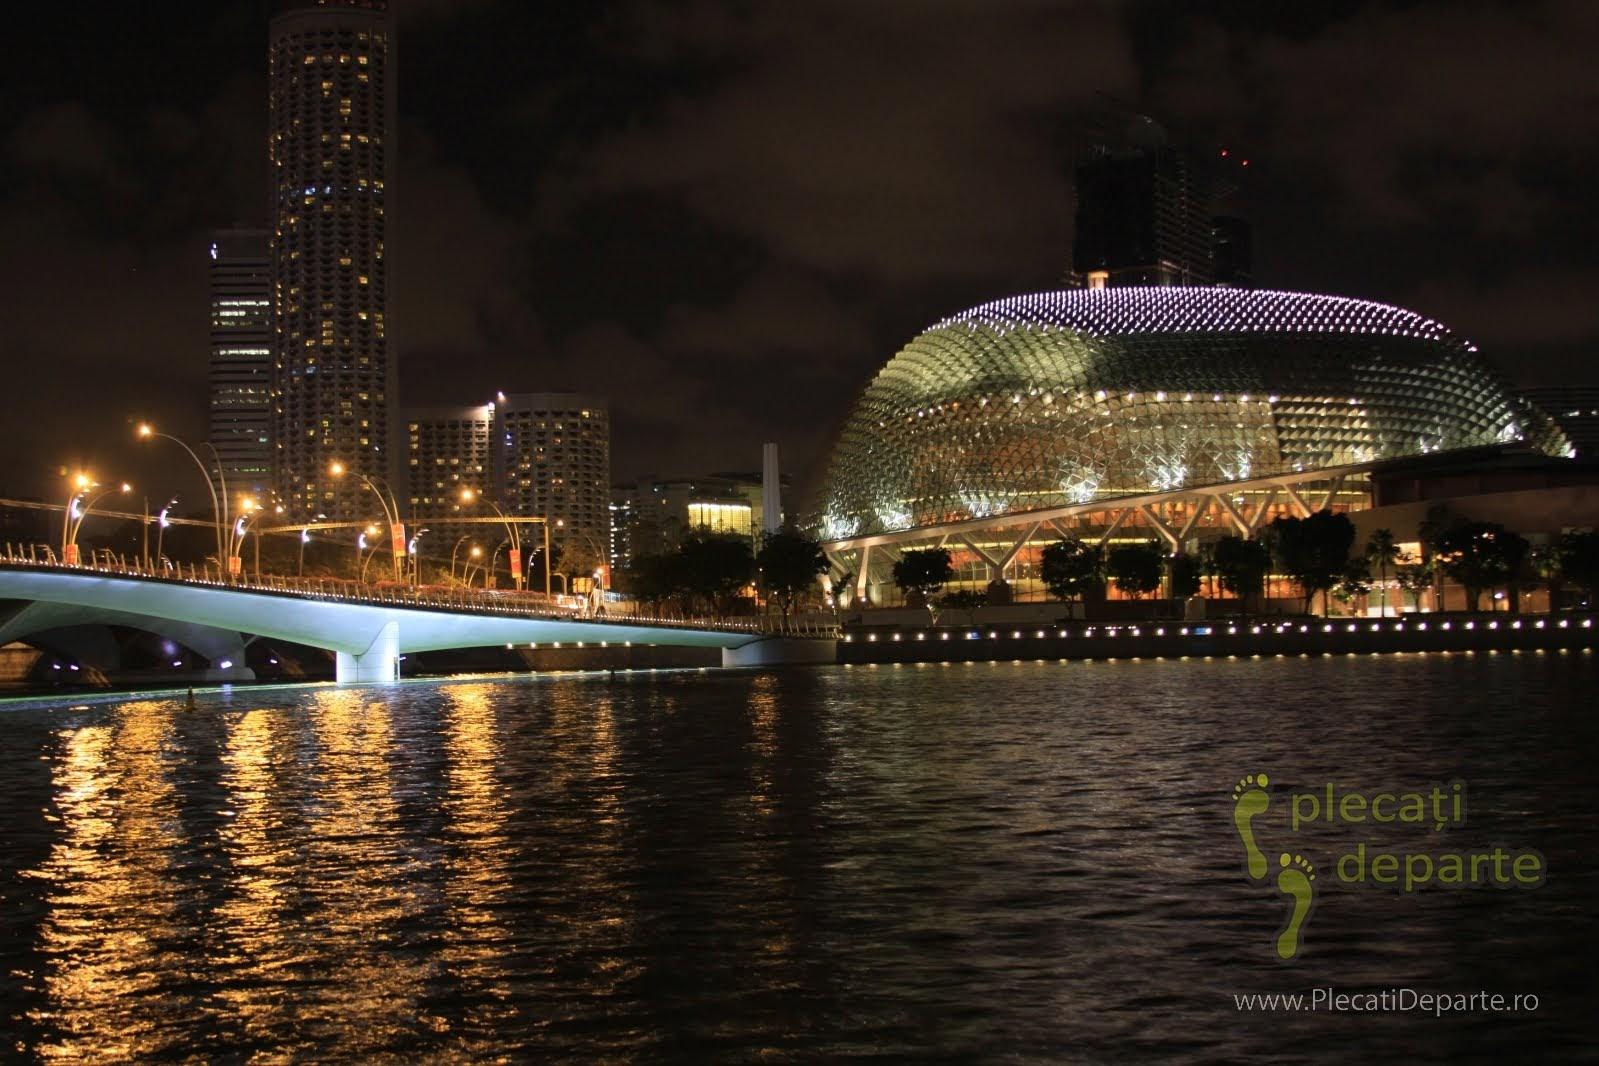 obiective turistice Singapore - Marina Bay - Esplanade - Theatres by the Bay noaptea. Privita din Aer cladirea are forma ochilor de viespe